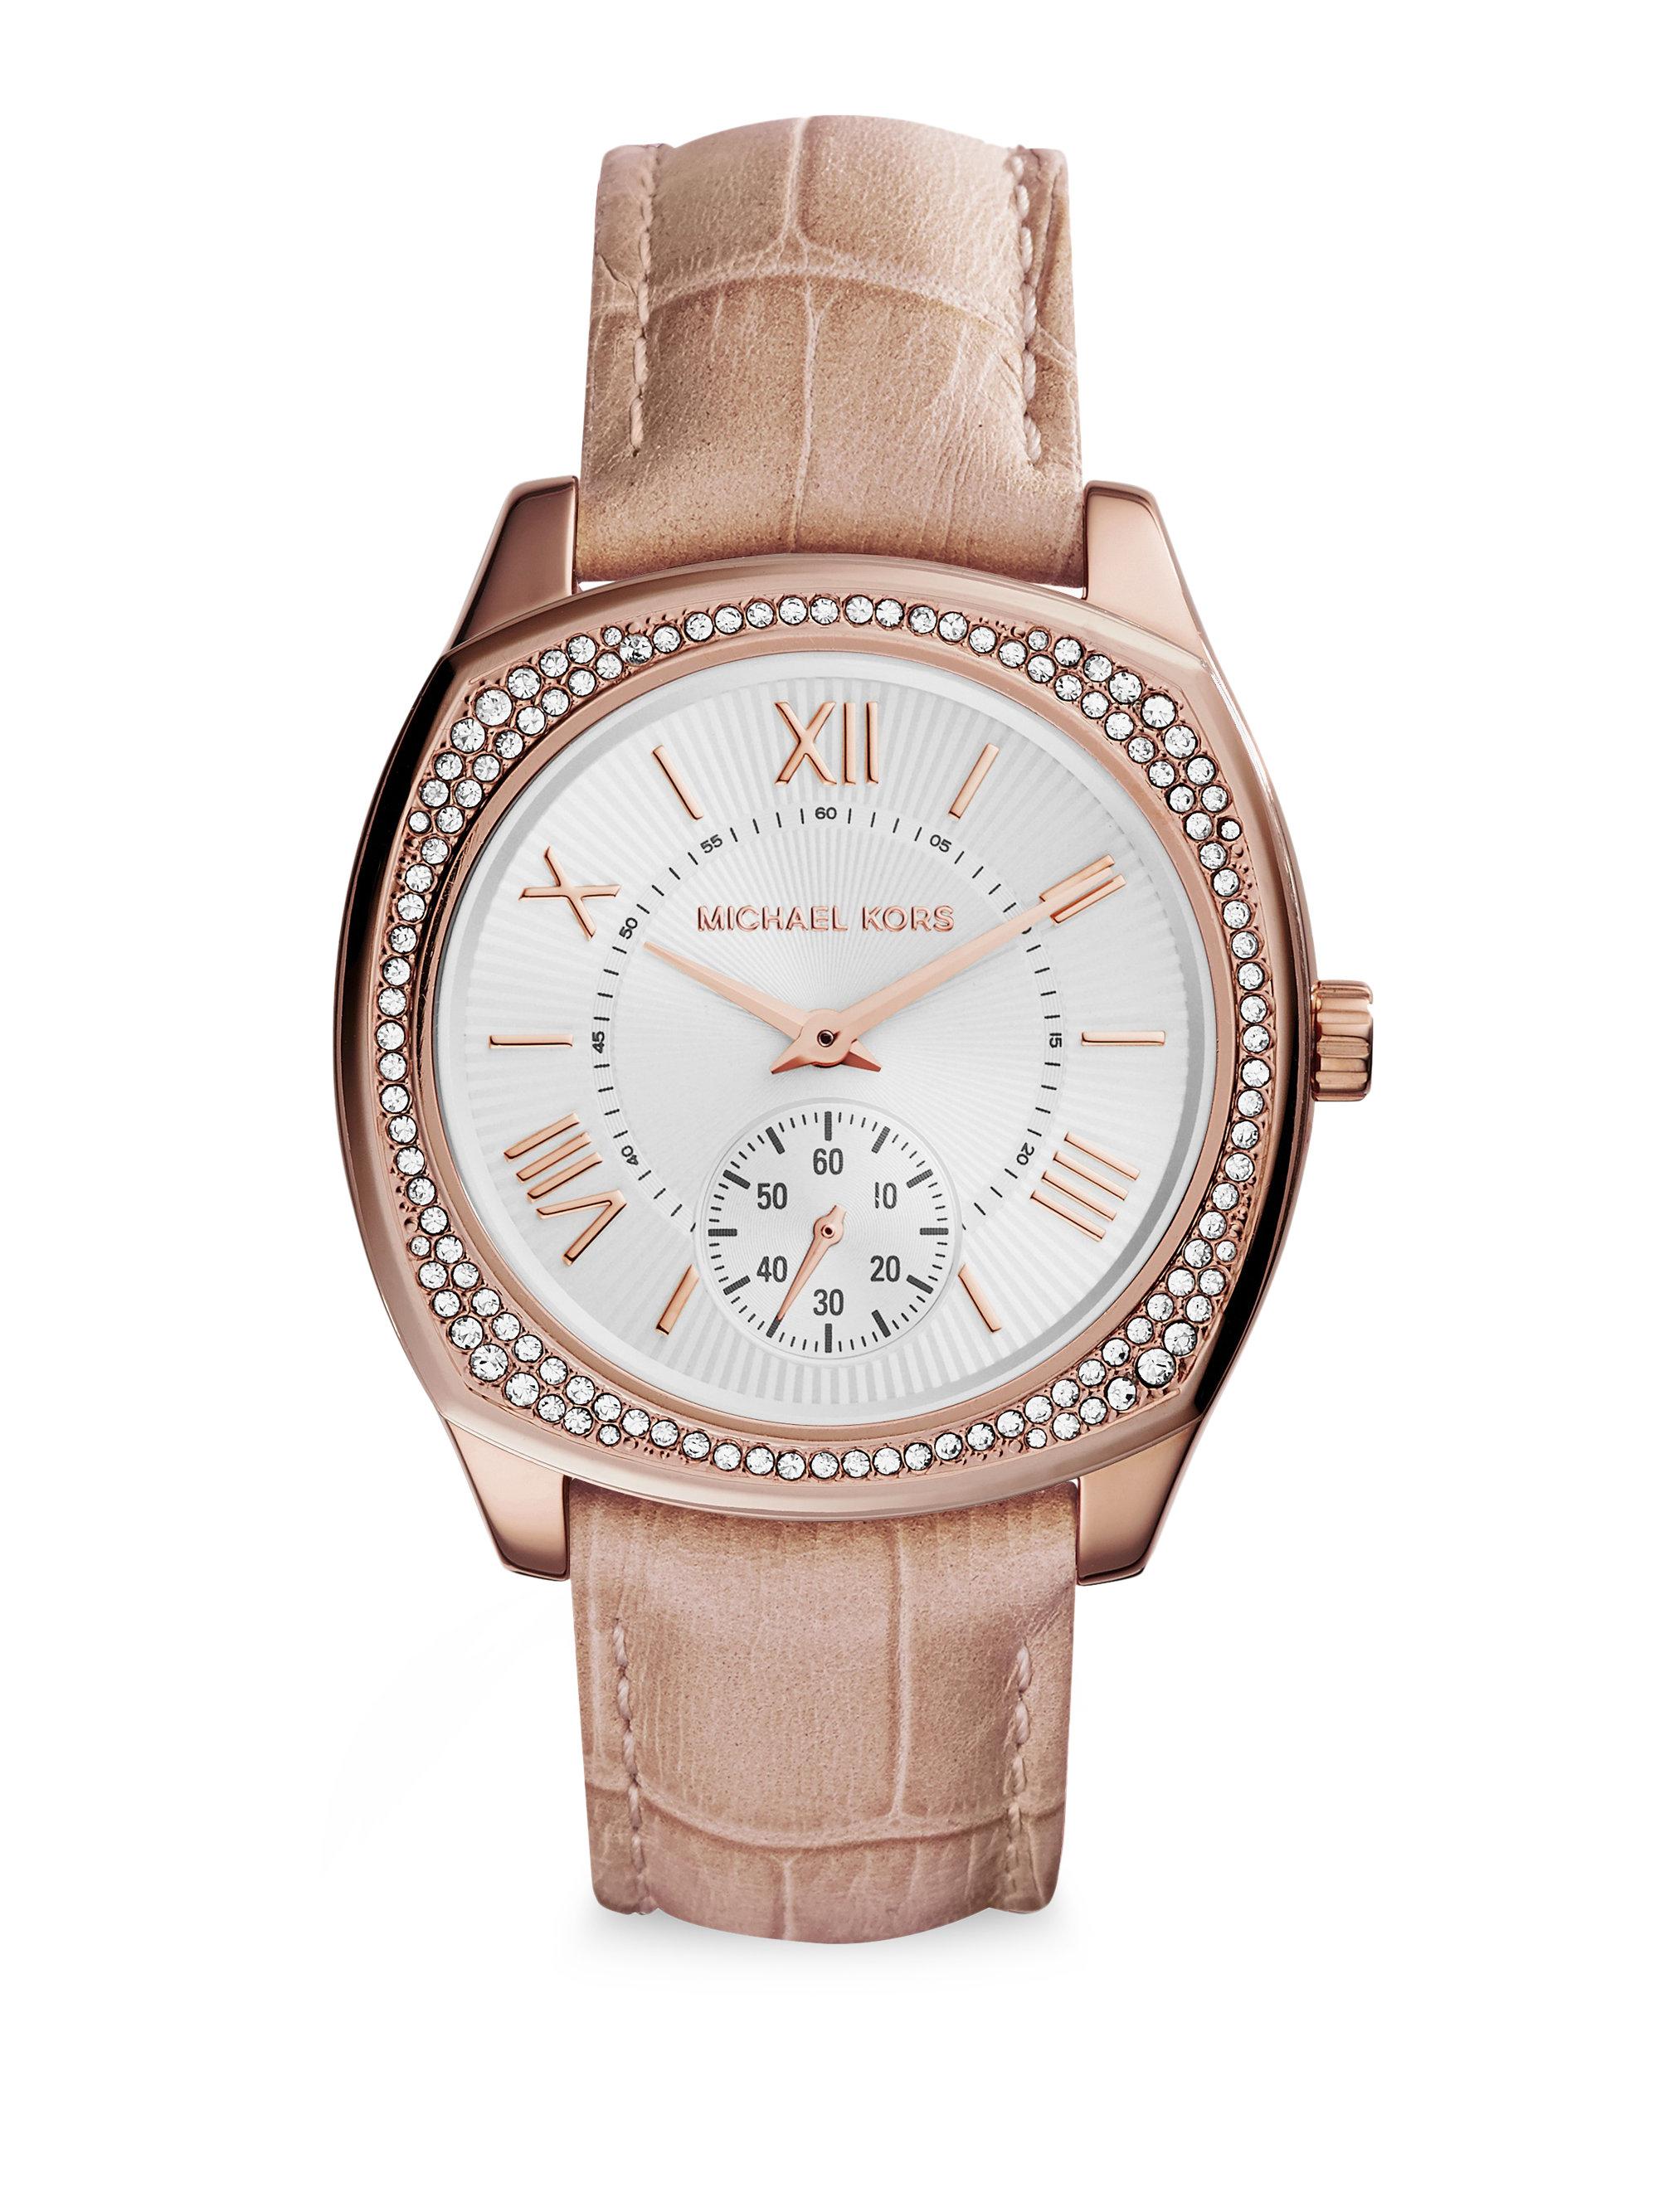 6386fda02a04 Lyst - Michael Kors MK2388 Bryn Watch in Pink